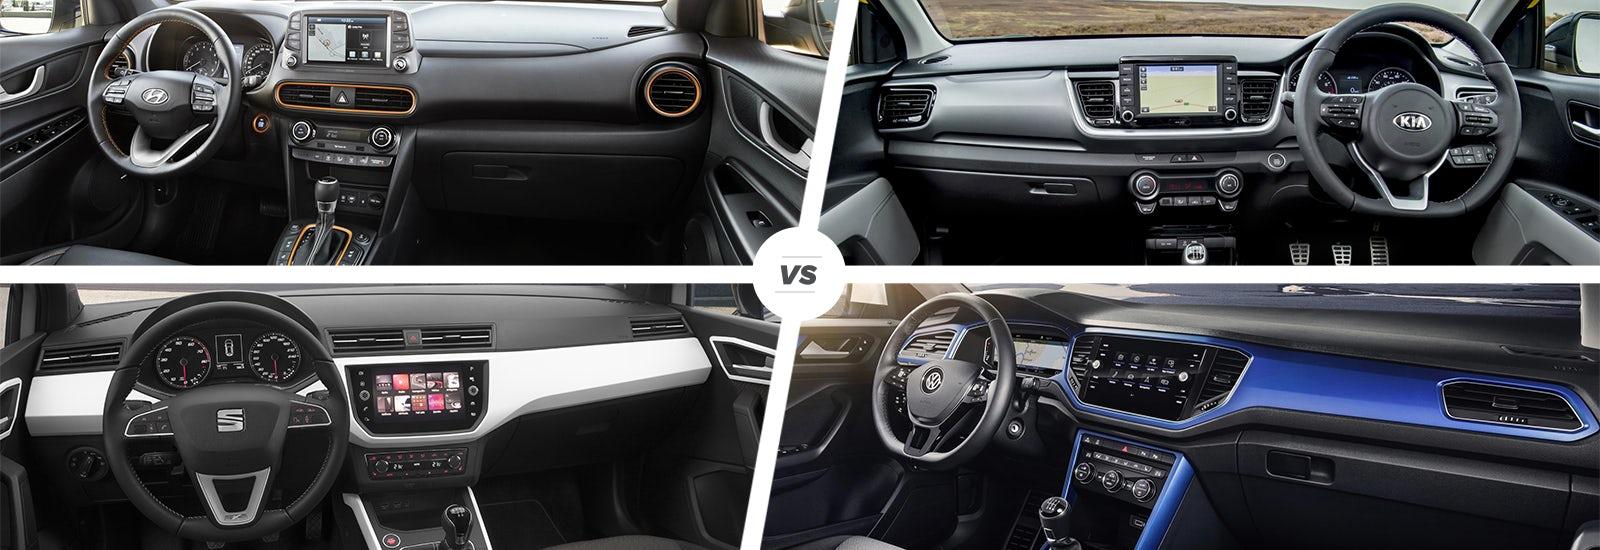 Hyundai kona vs kia stonic vs seat arona vs vw t roc carwow for Interior volkswagen t roc